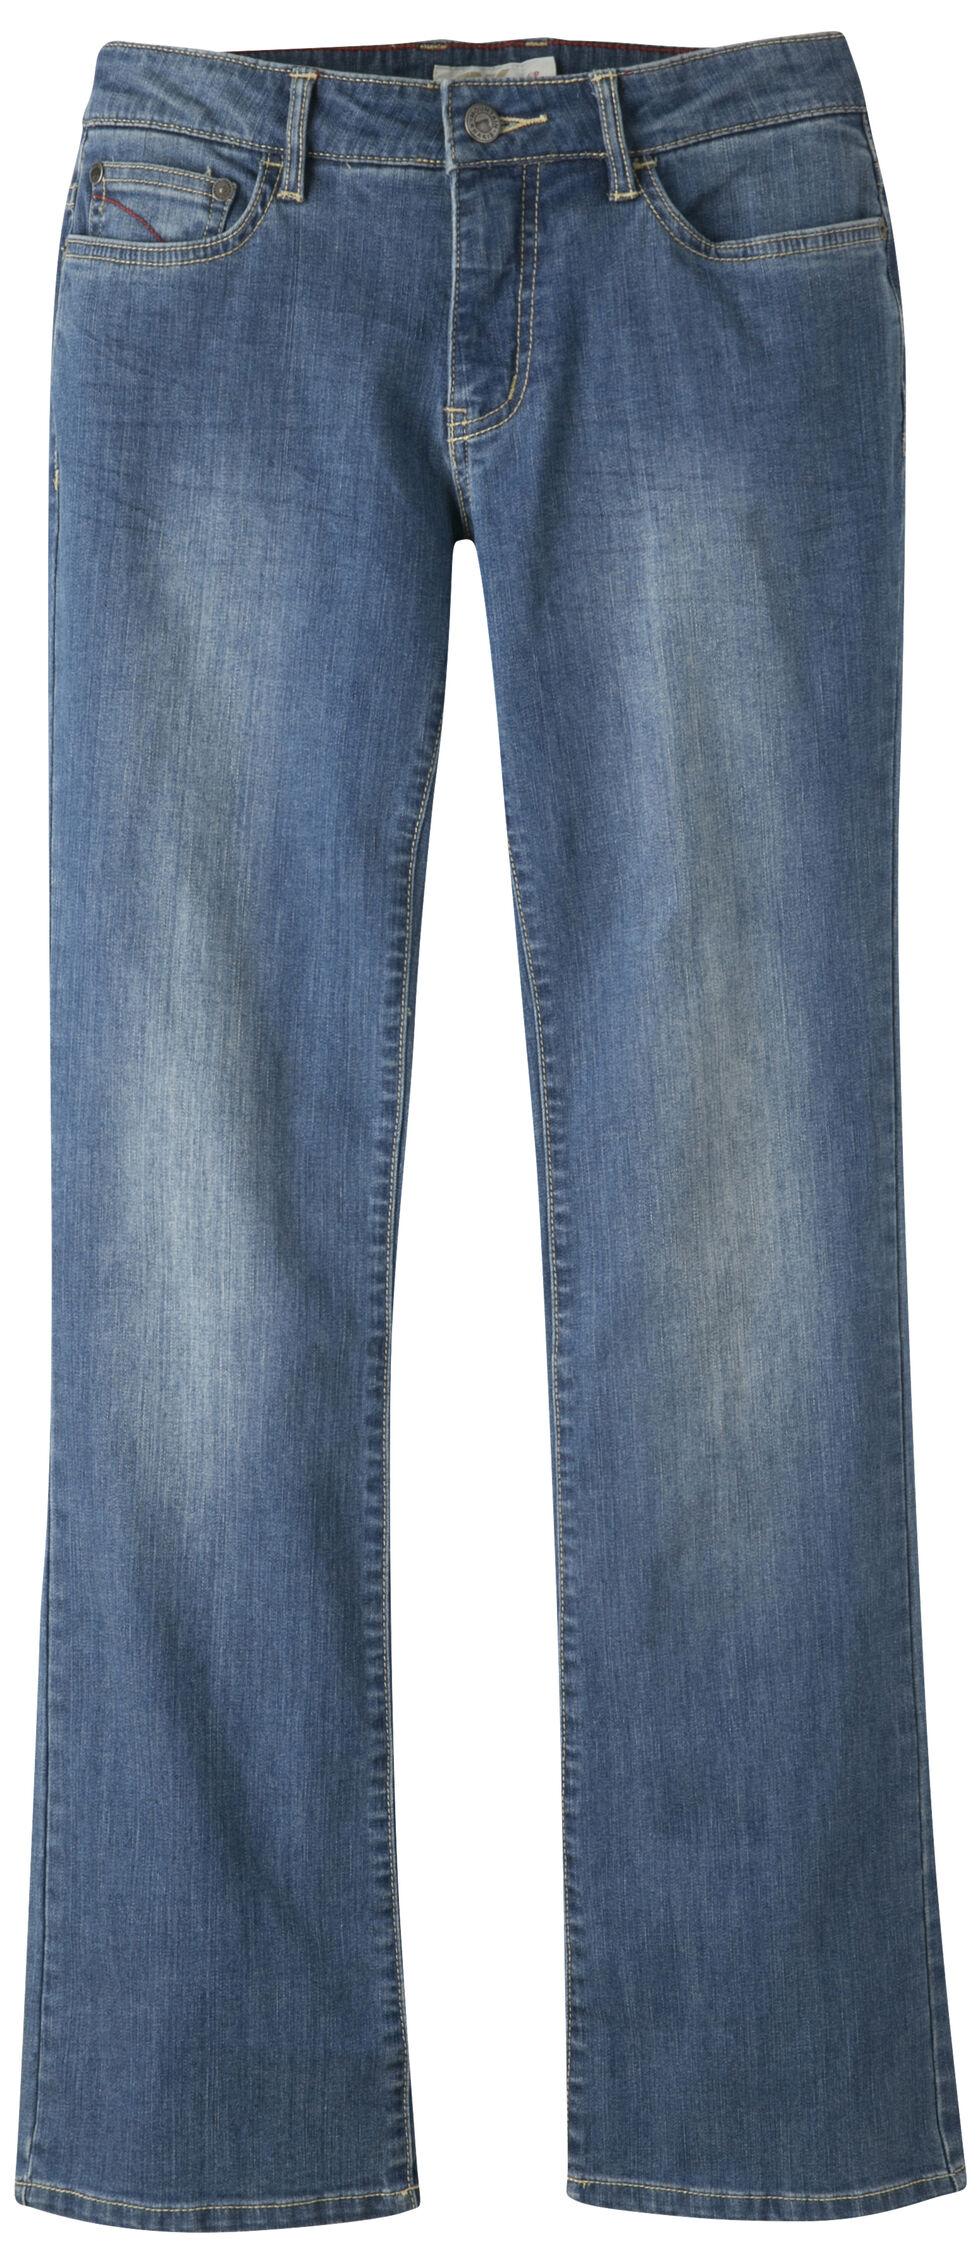 Mountain Khakis Women's Genevieve Boot Cut Jeans - Petite, Blue, hi-res